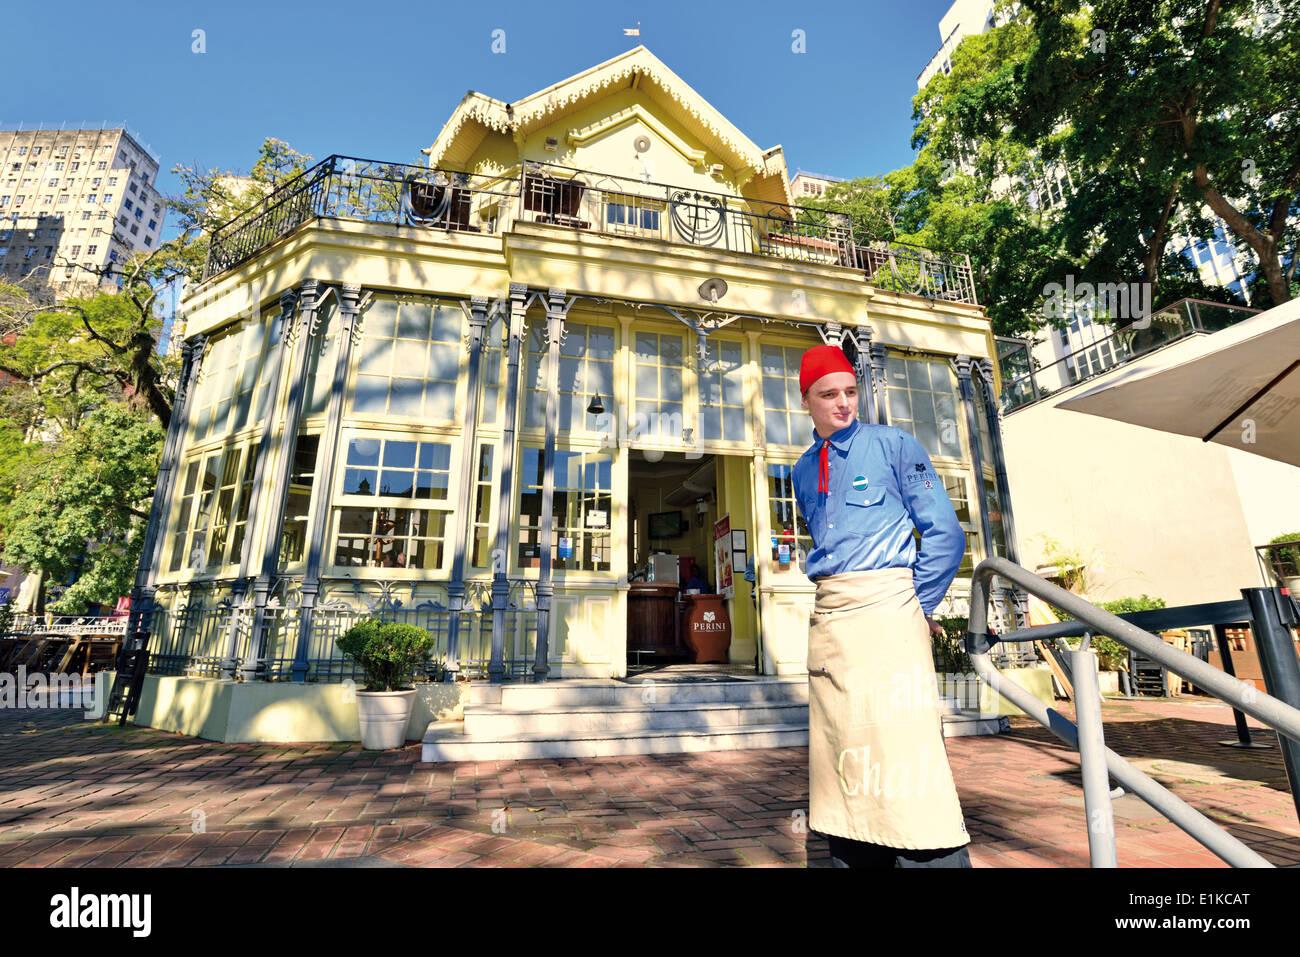 Brazil, Porto Alegre: Historic Art Nouveau restaurant and beer house 'Chalet da Praca XV' - Stock Image